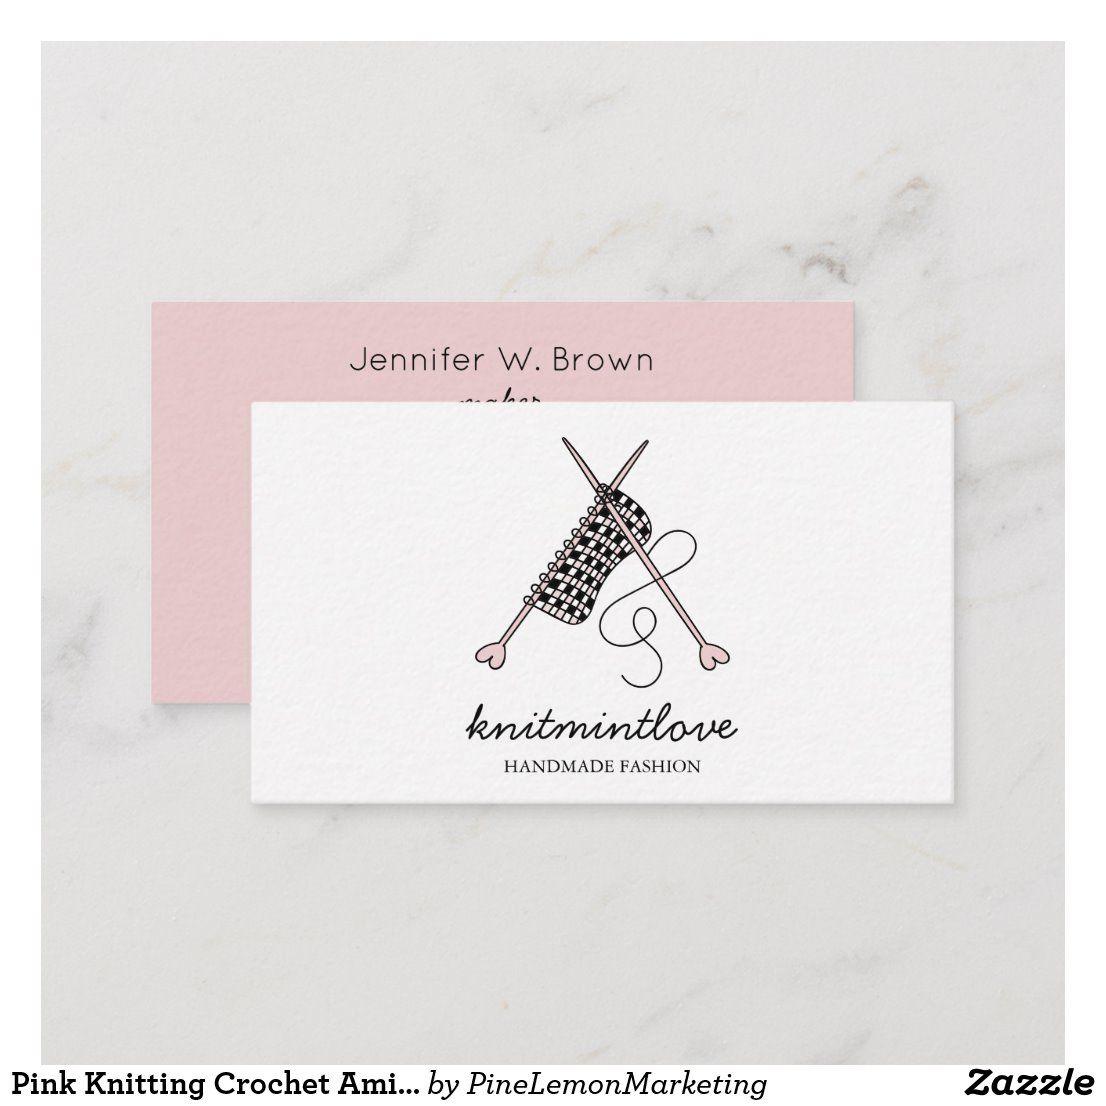 Pink Knitting Crochet Amigurumi Maker Business Card Zazzle Com Knitting Business Fashion Business Cards Crochet Business